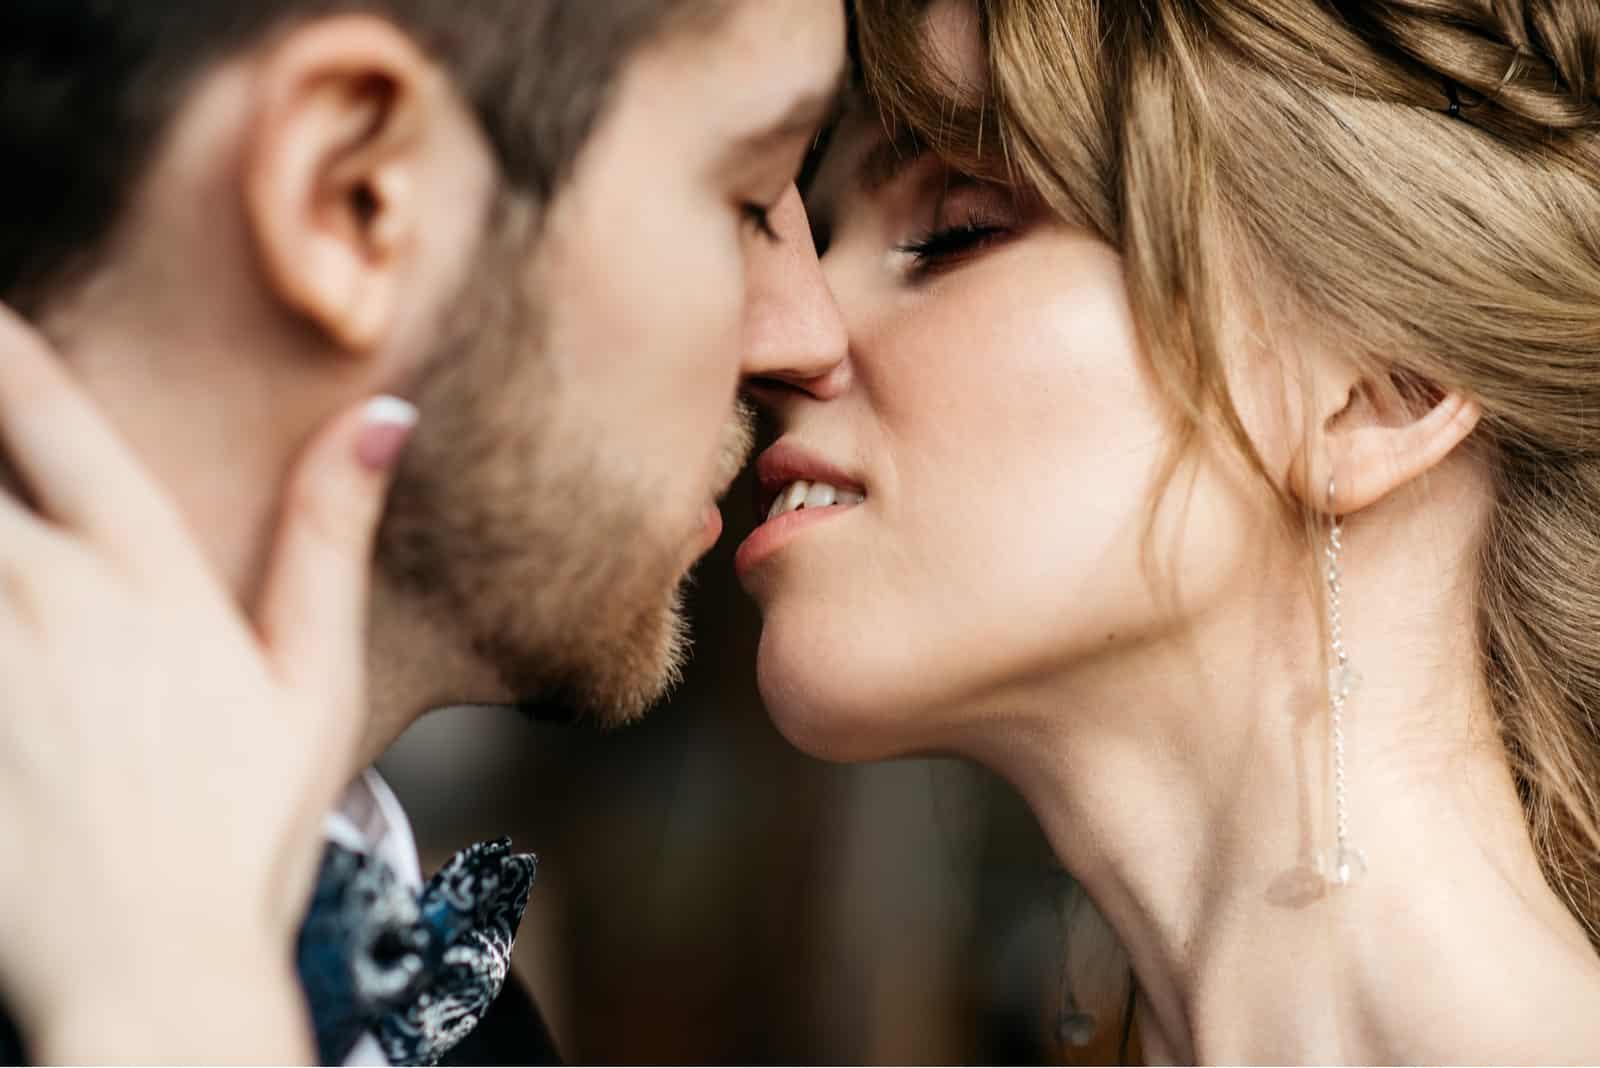 a woman loves a man